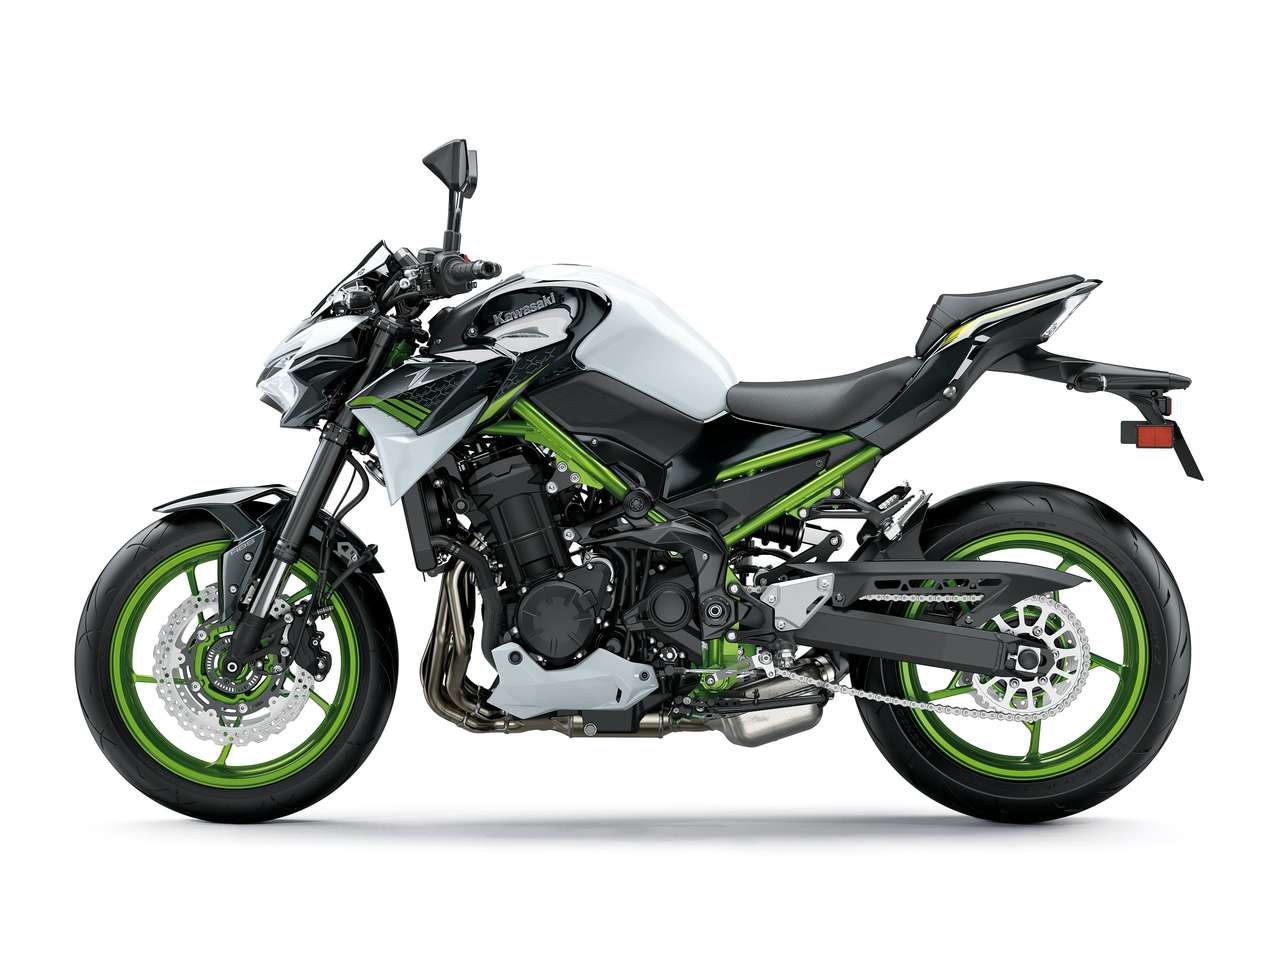 Kawasaki Z 900 2021 Pearl Blizzard White/Metallic Spark Black